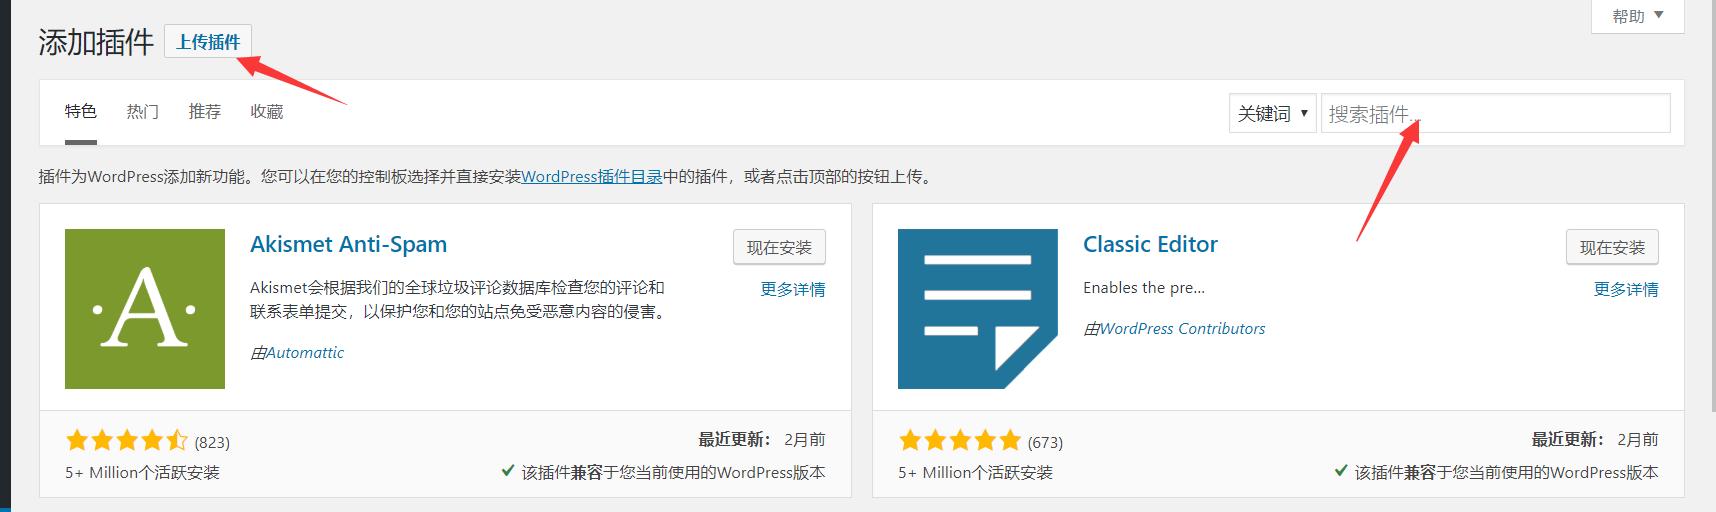 wordpress网站常用插件及安装 (2)